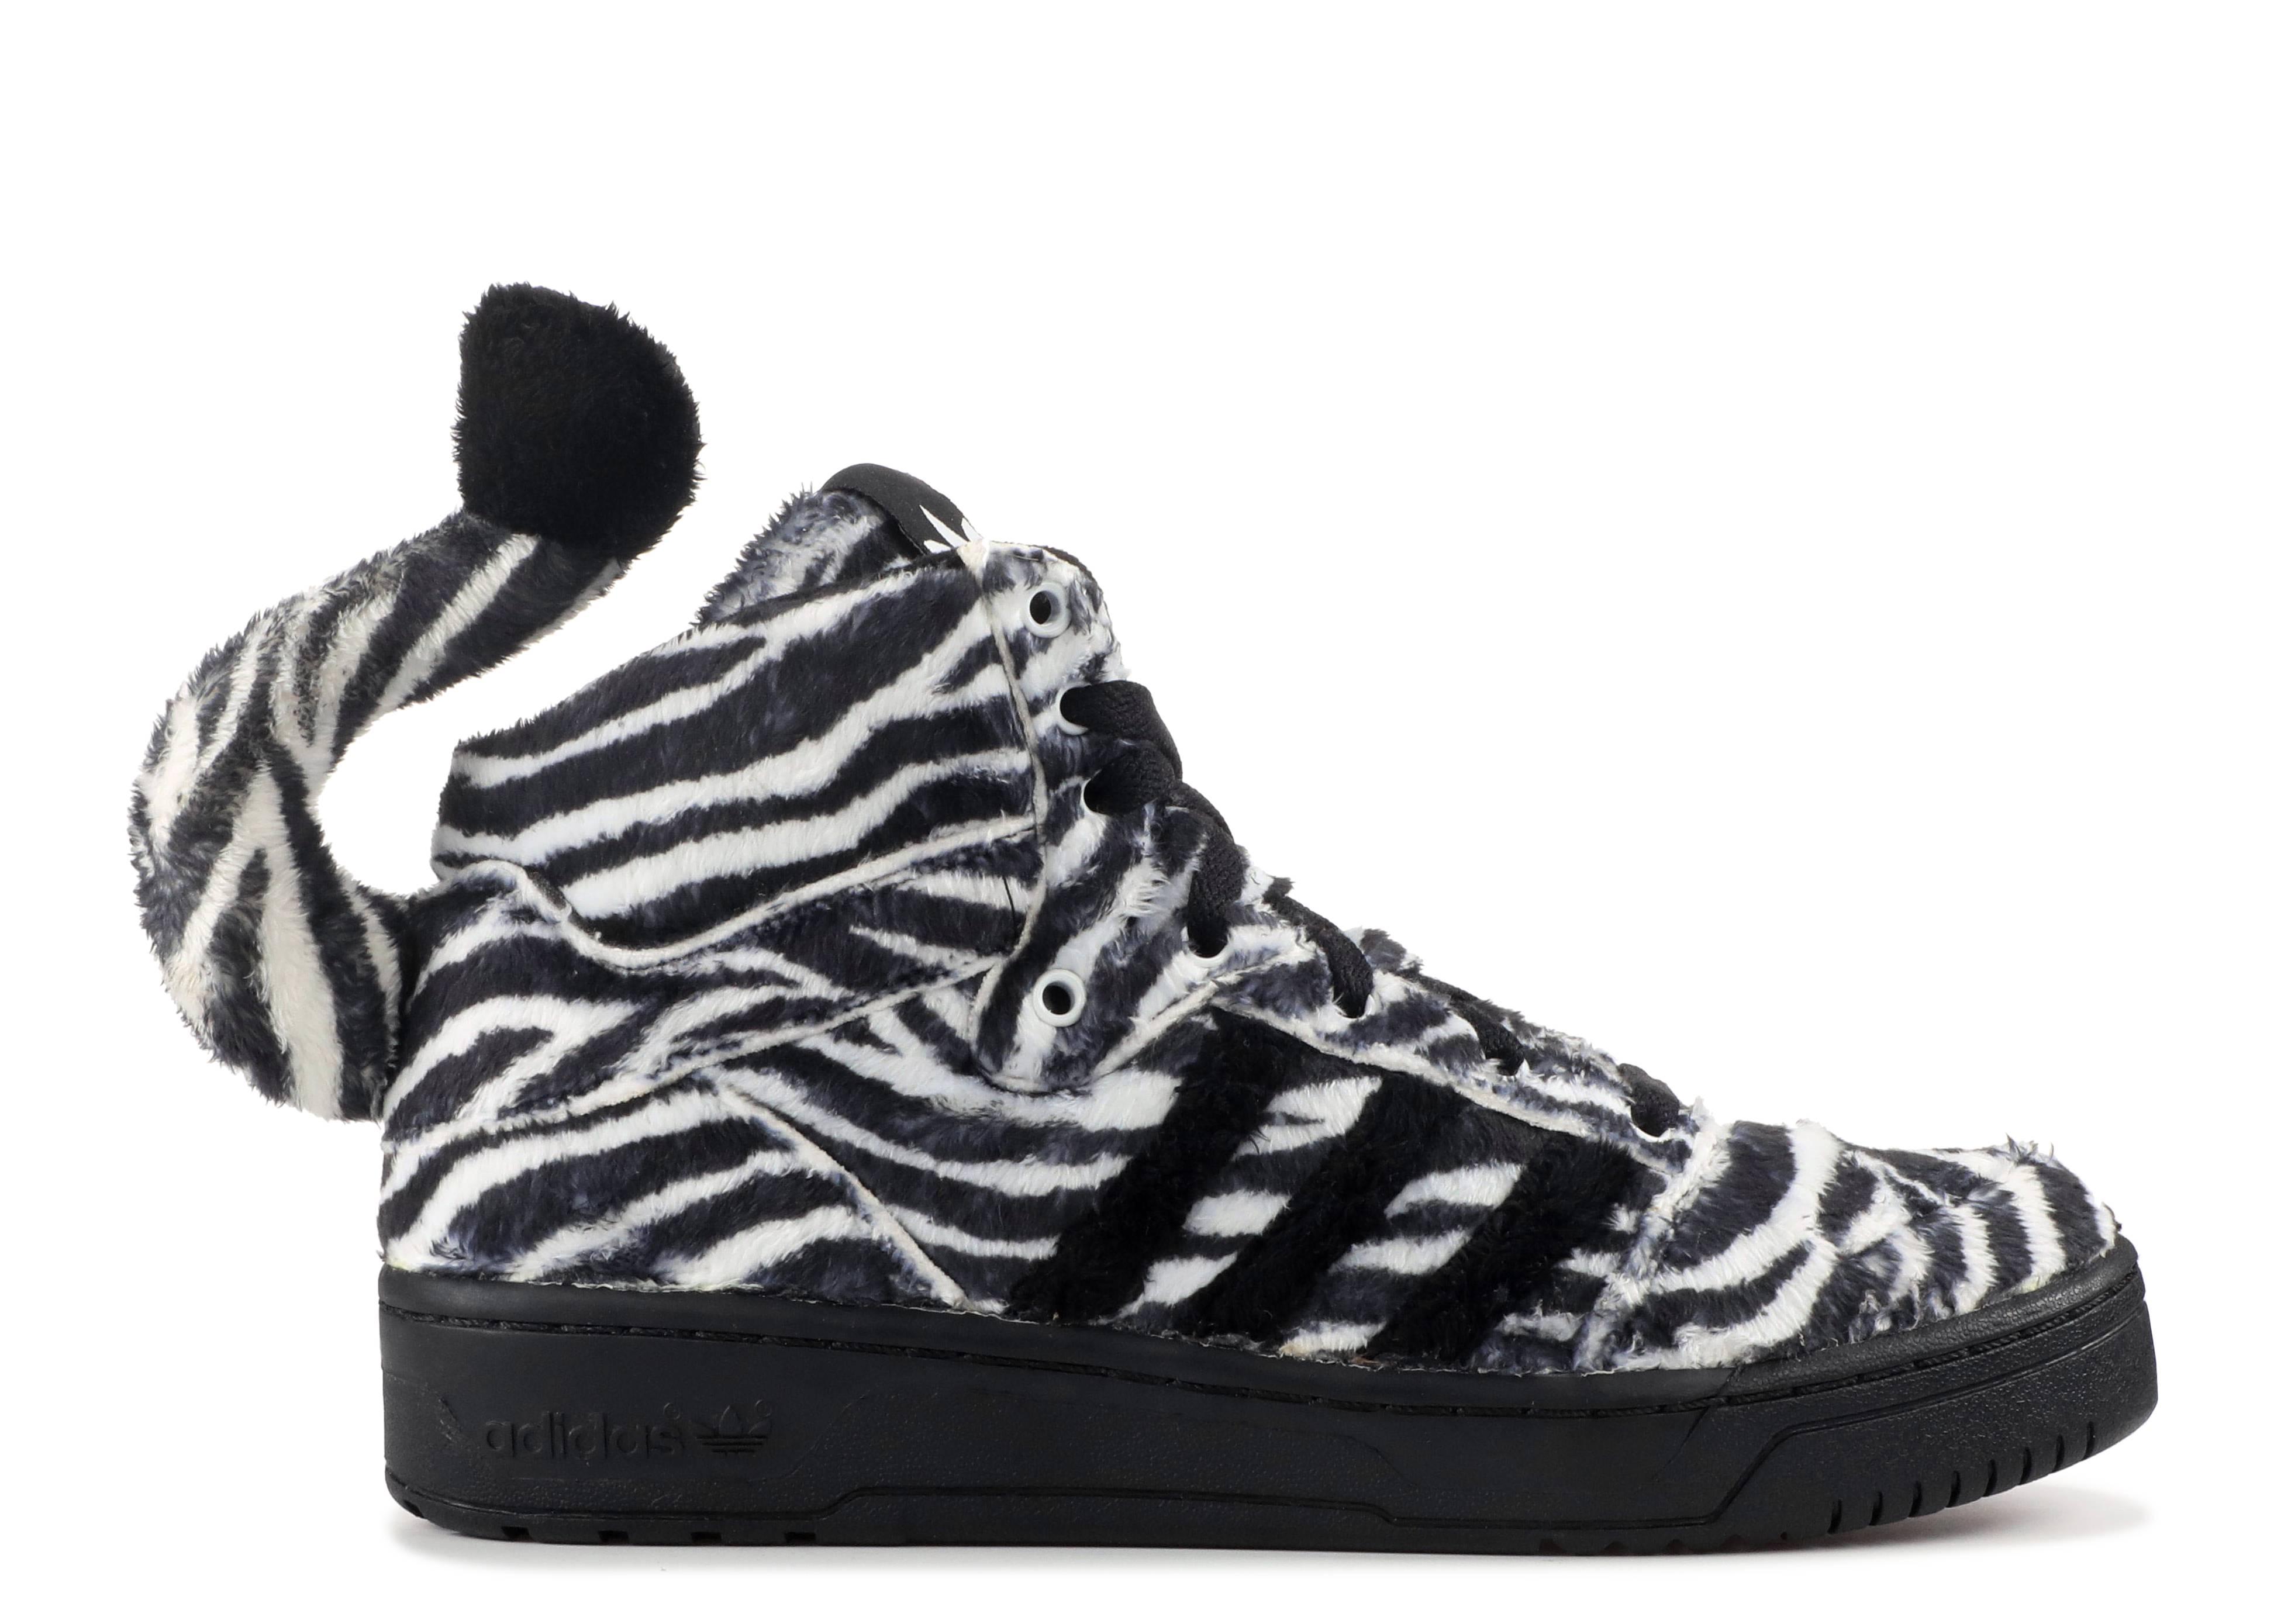 Js Zebra adidas g95749 black1 / runwht / blk1 Flight Club